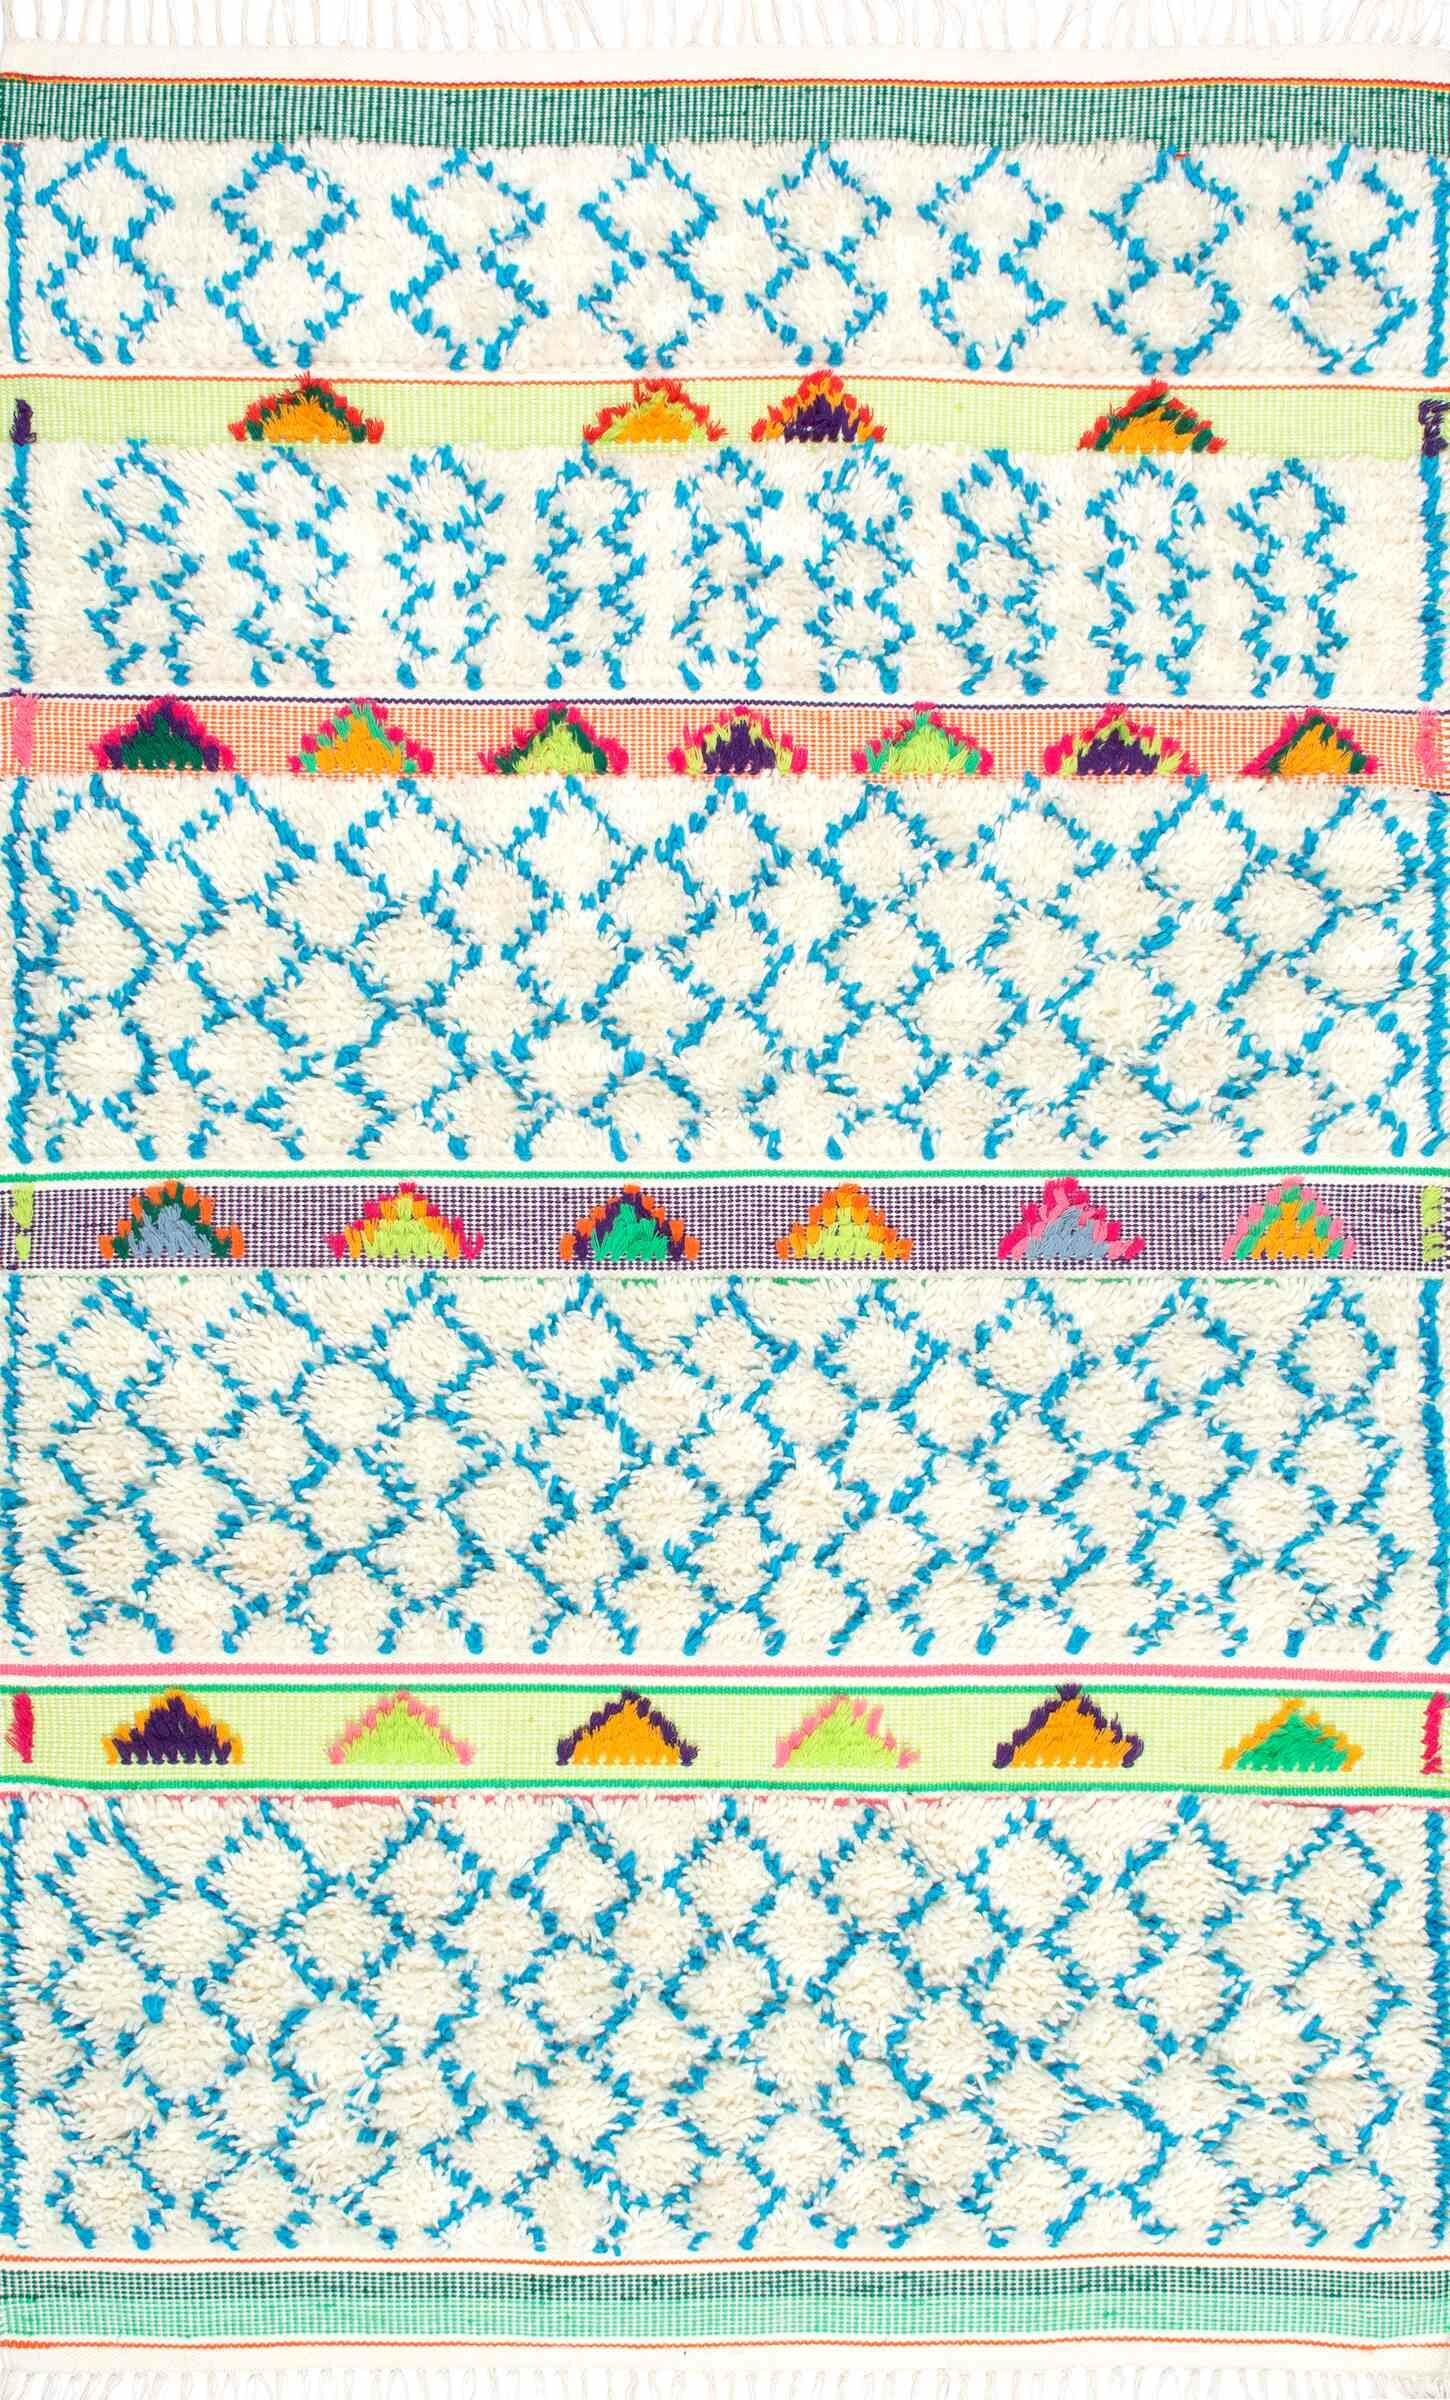 Claribel Hand-Tufted Ivory/Blue Area Rug Rug Size: Rectangle 5' x 8'